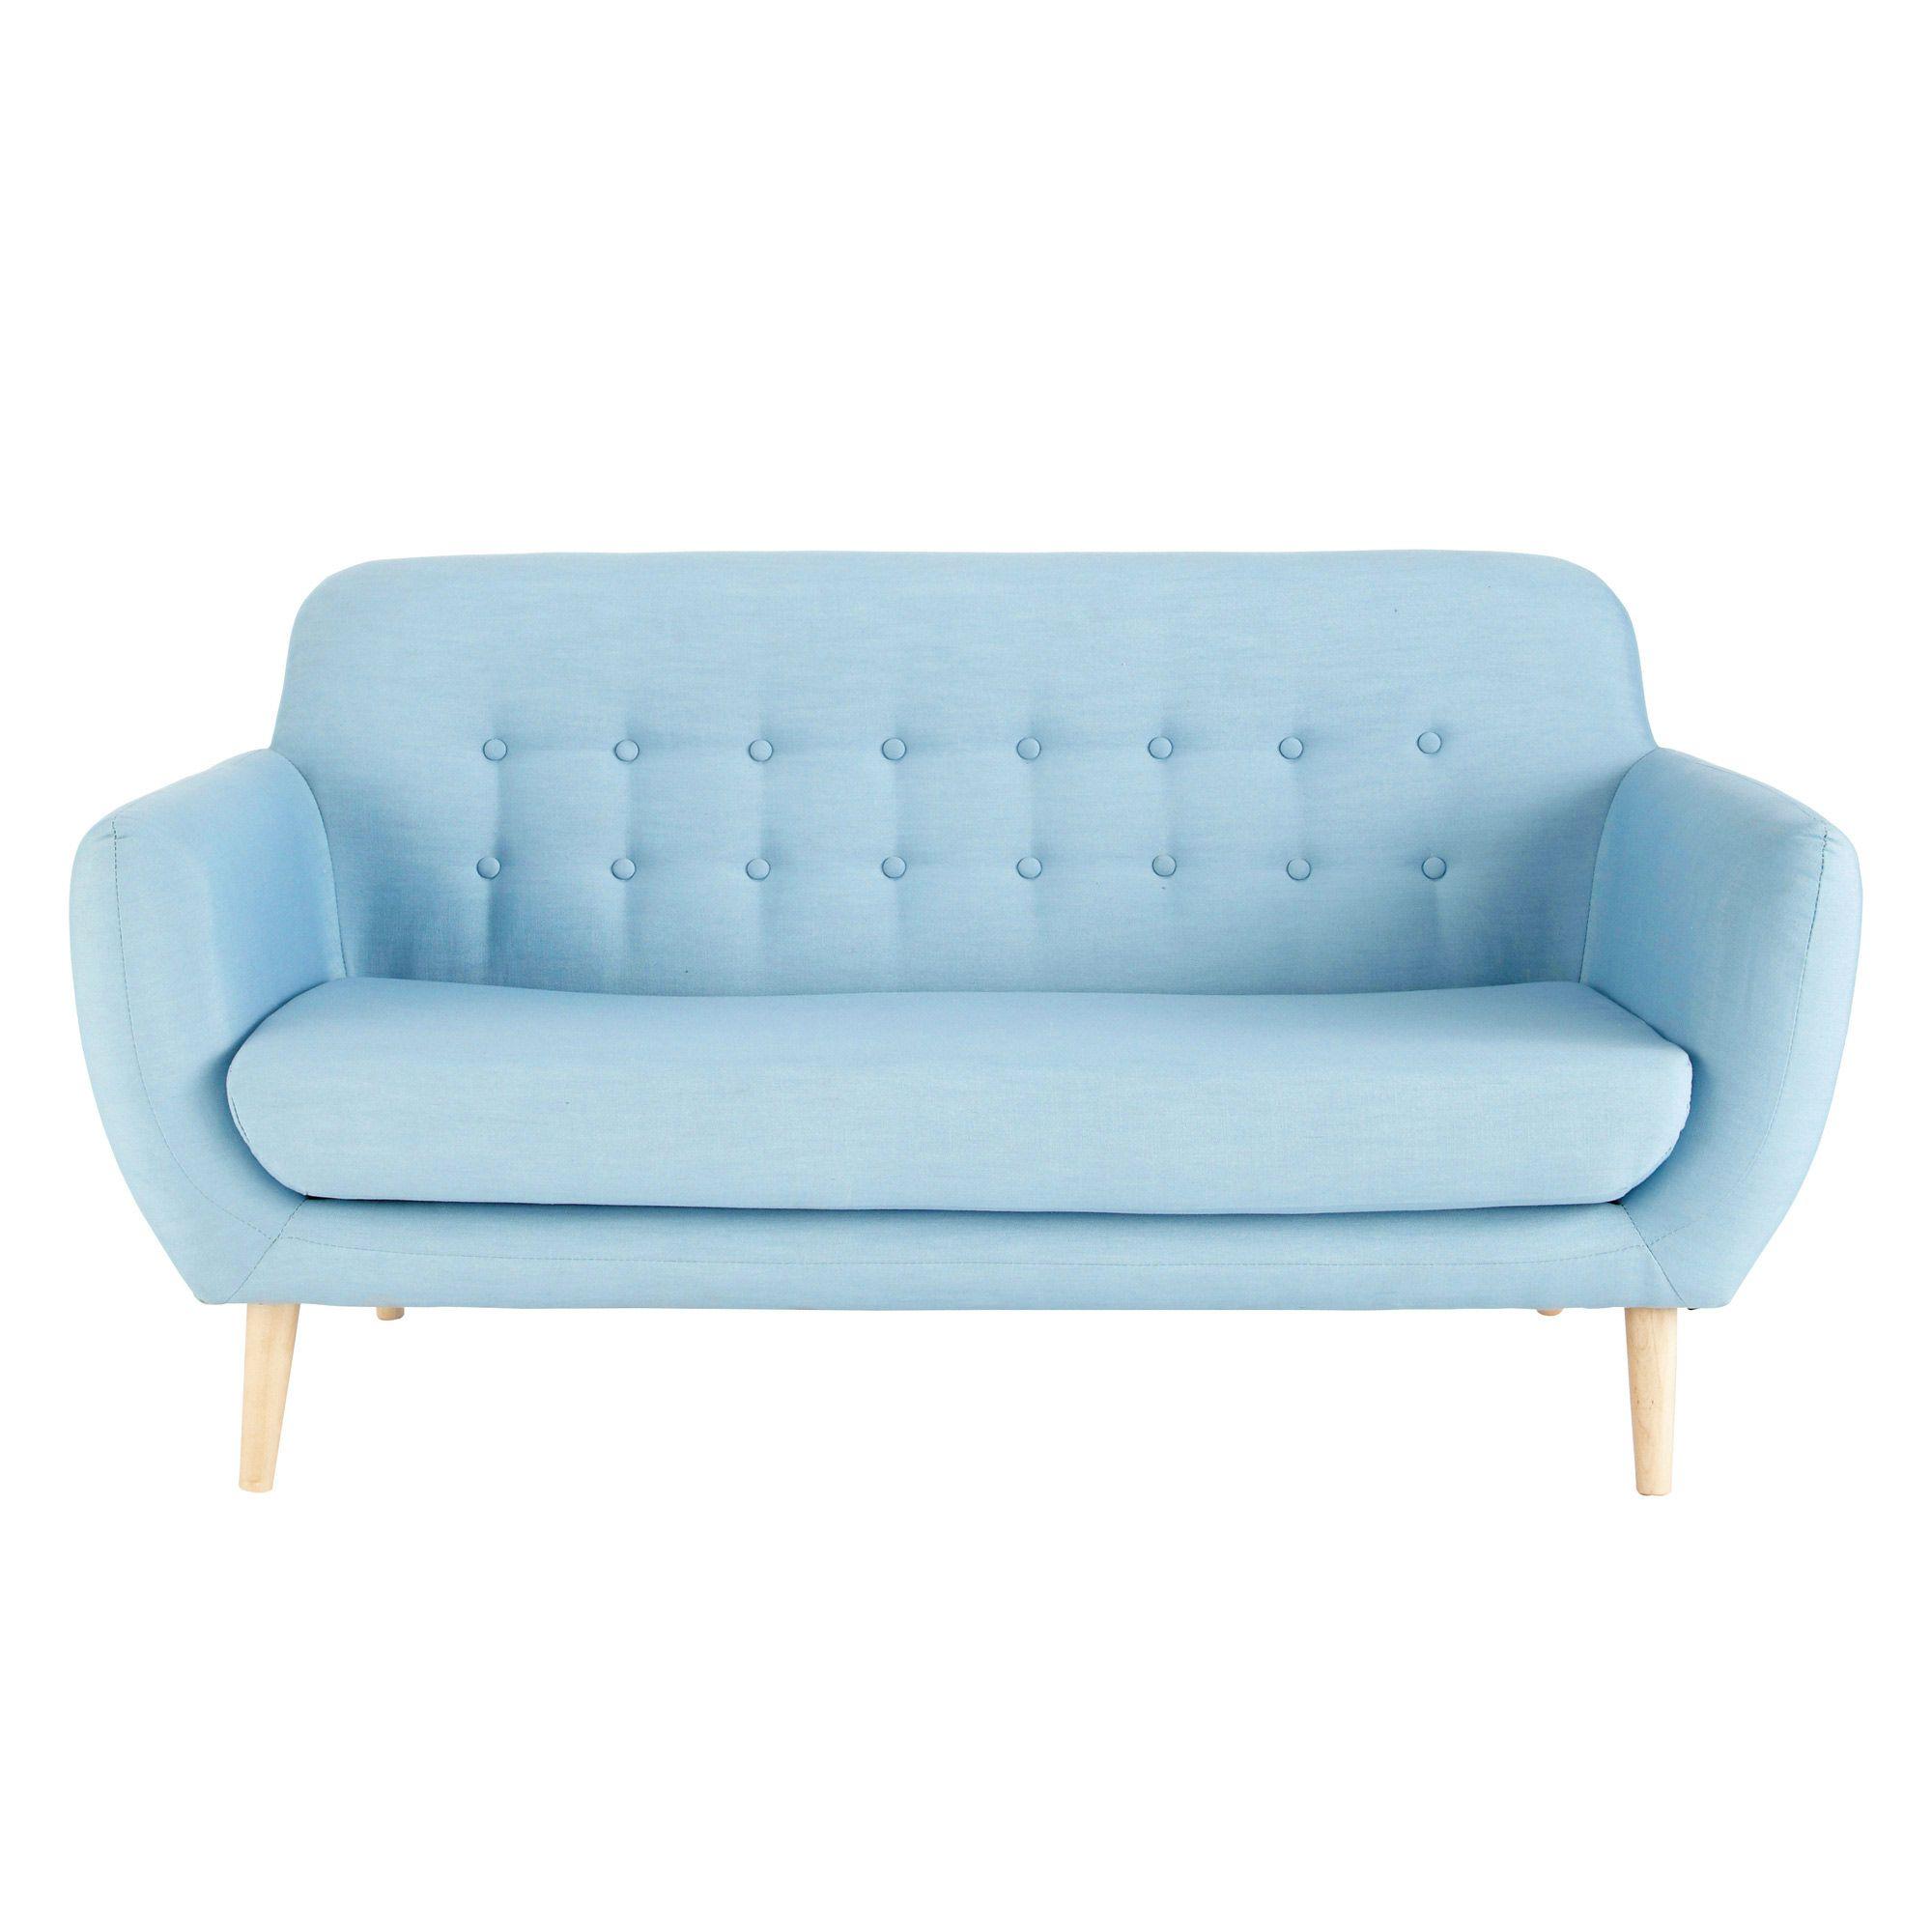 Canapé scandinave 2/3 places en tissu bleu | Living rooms, Comfy ...